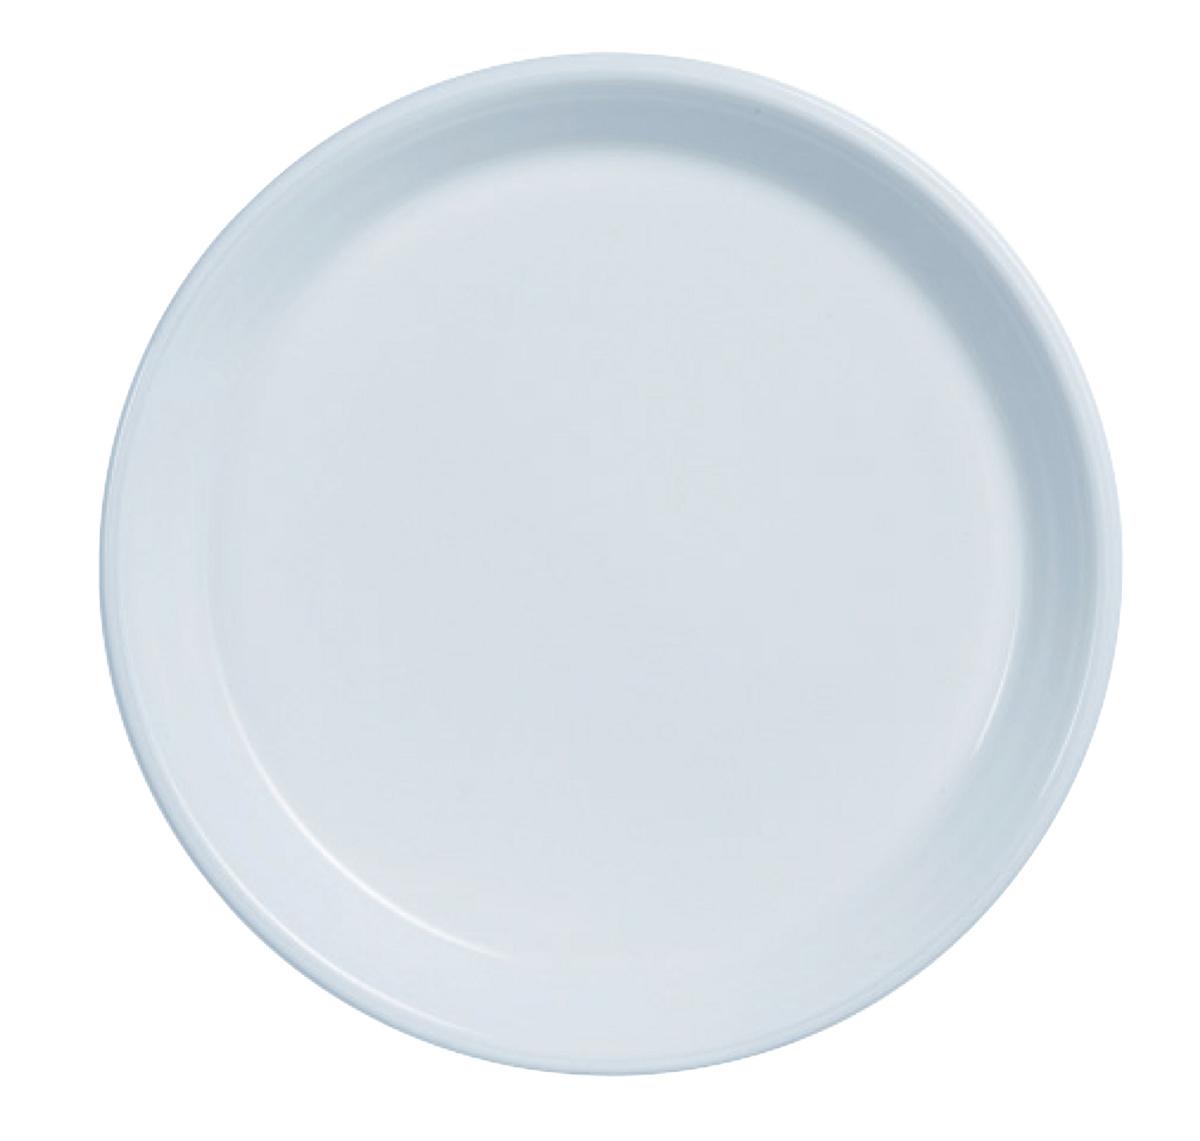 Assiette plate ronde blanc verre Ø 23 cm Heat System Arcoroc